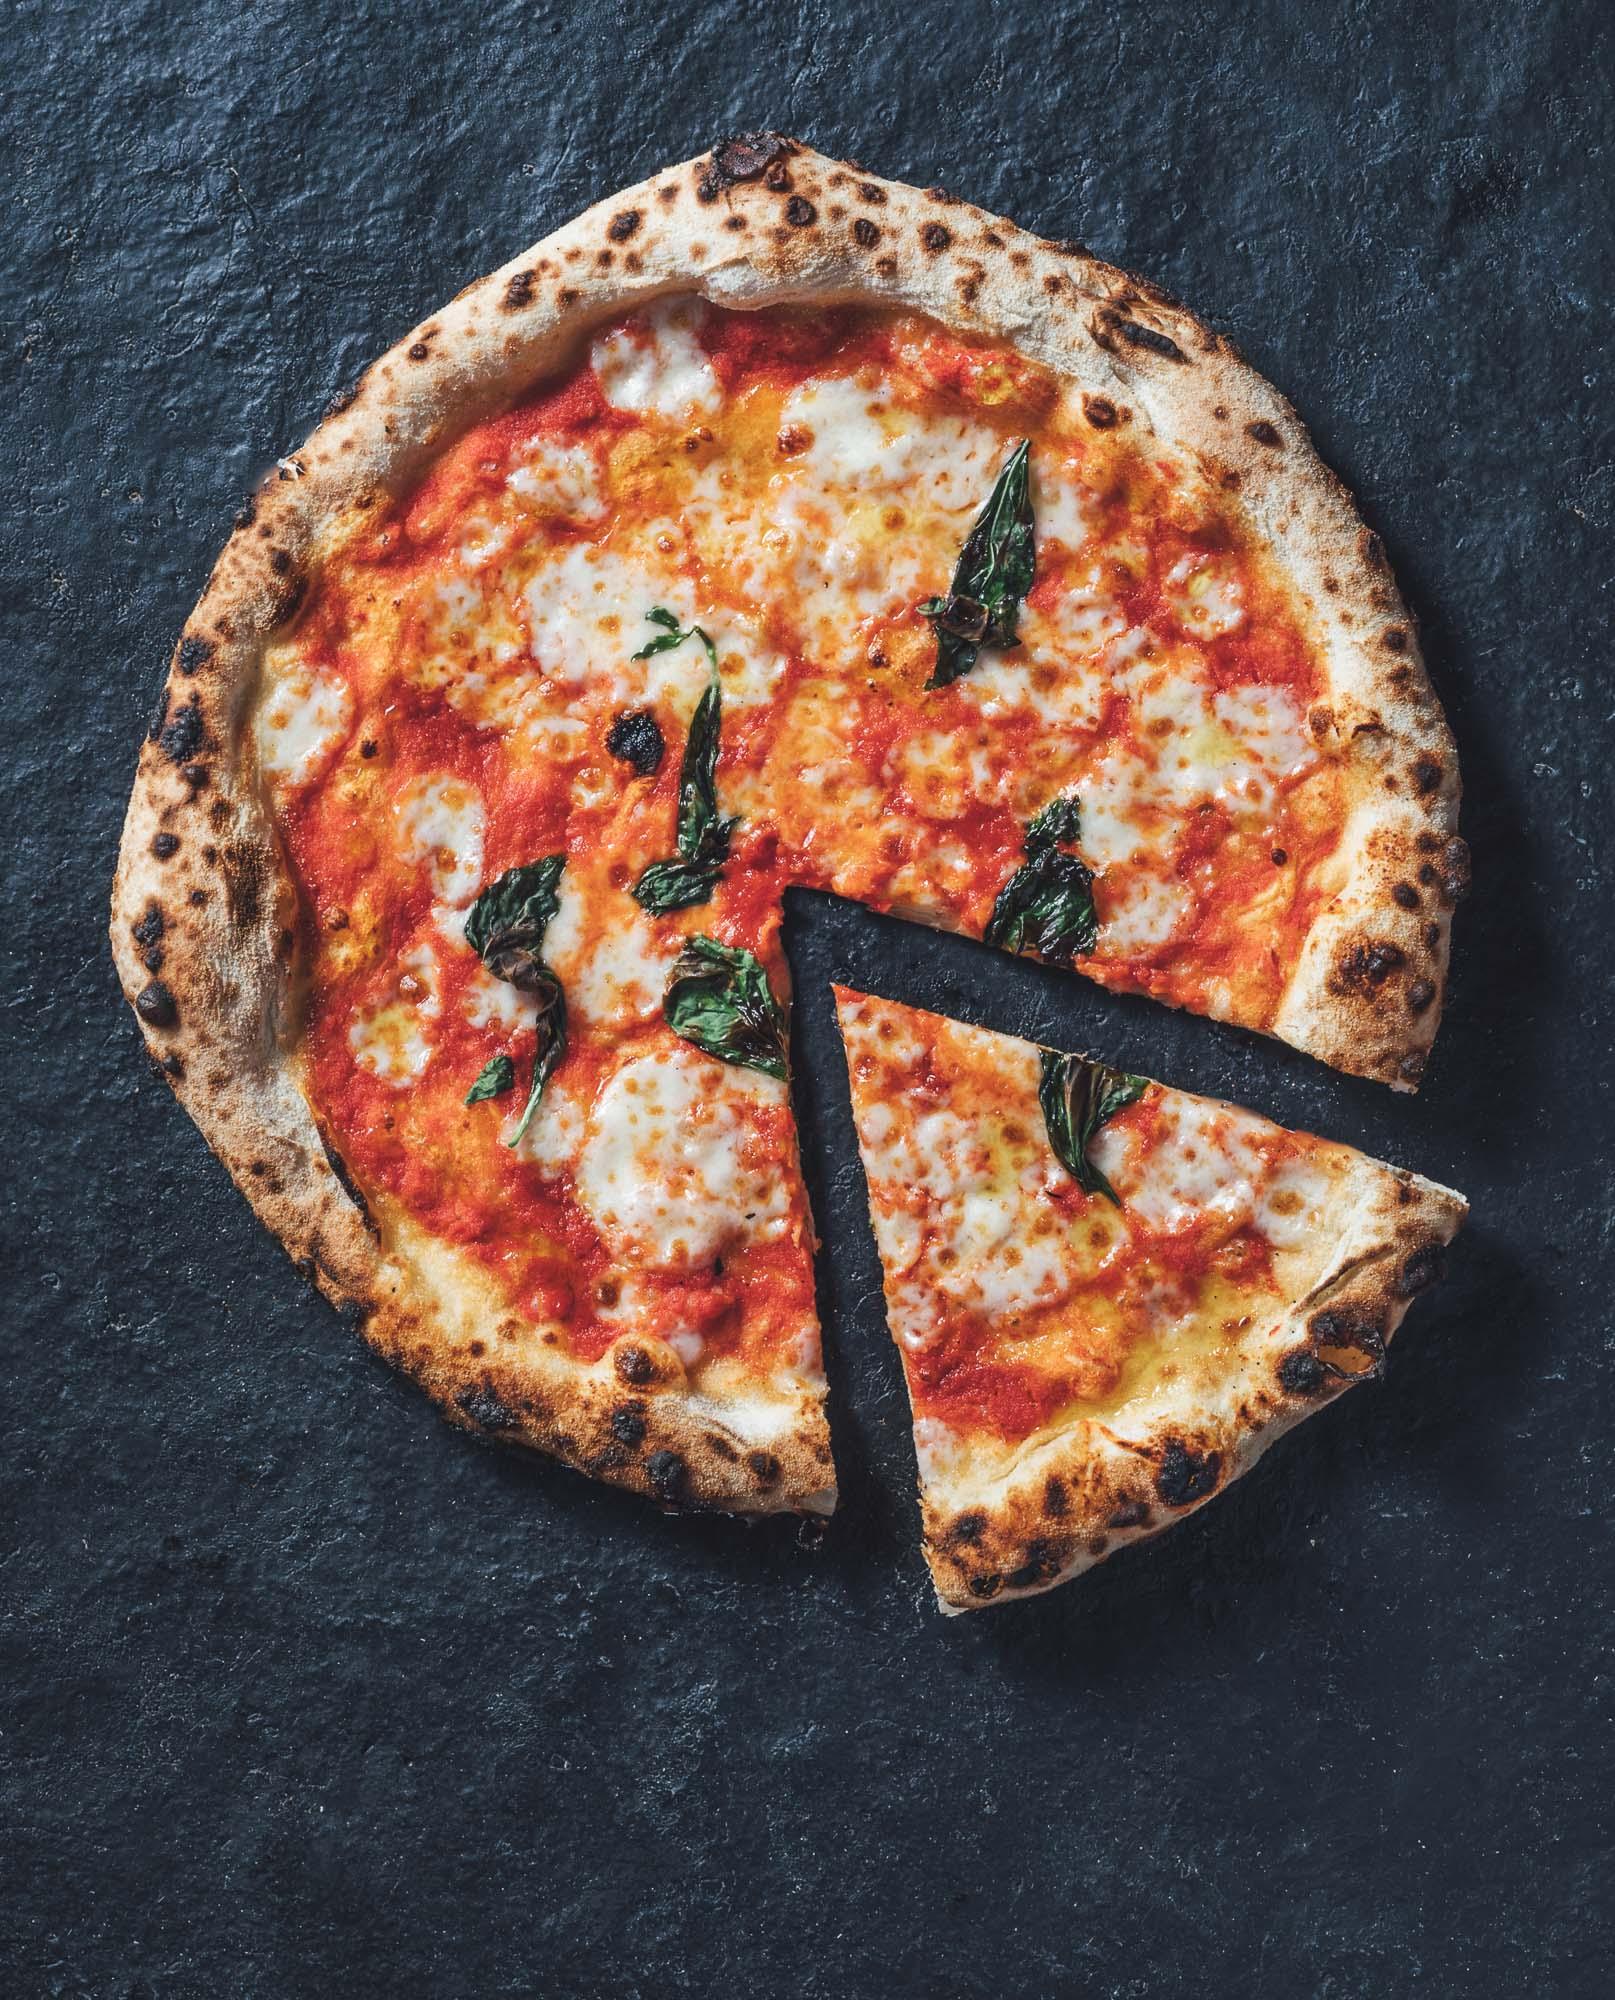 Wood Fired Margherita Pizza at The Navigation Inn pub and restaurant in Cosgrove near Milton Keynes.jpg